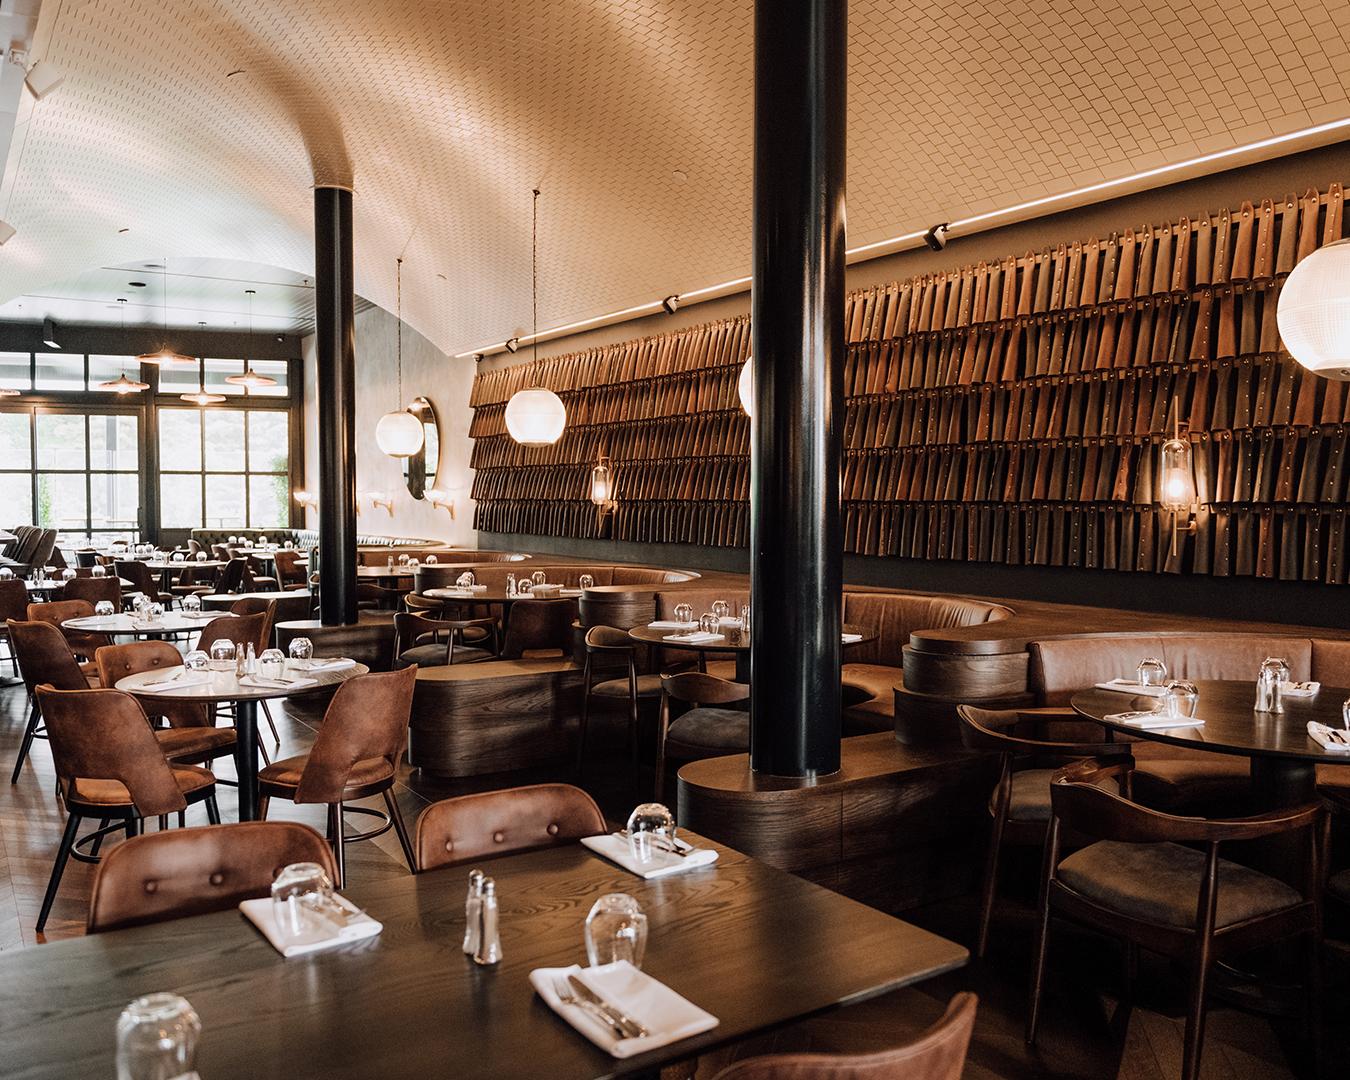 New York Grill Restaurant on Westfield Newmarket's Rooftop Precint